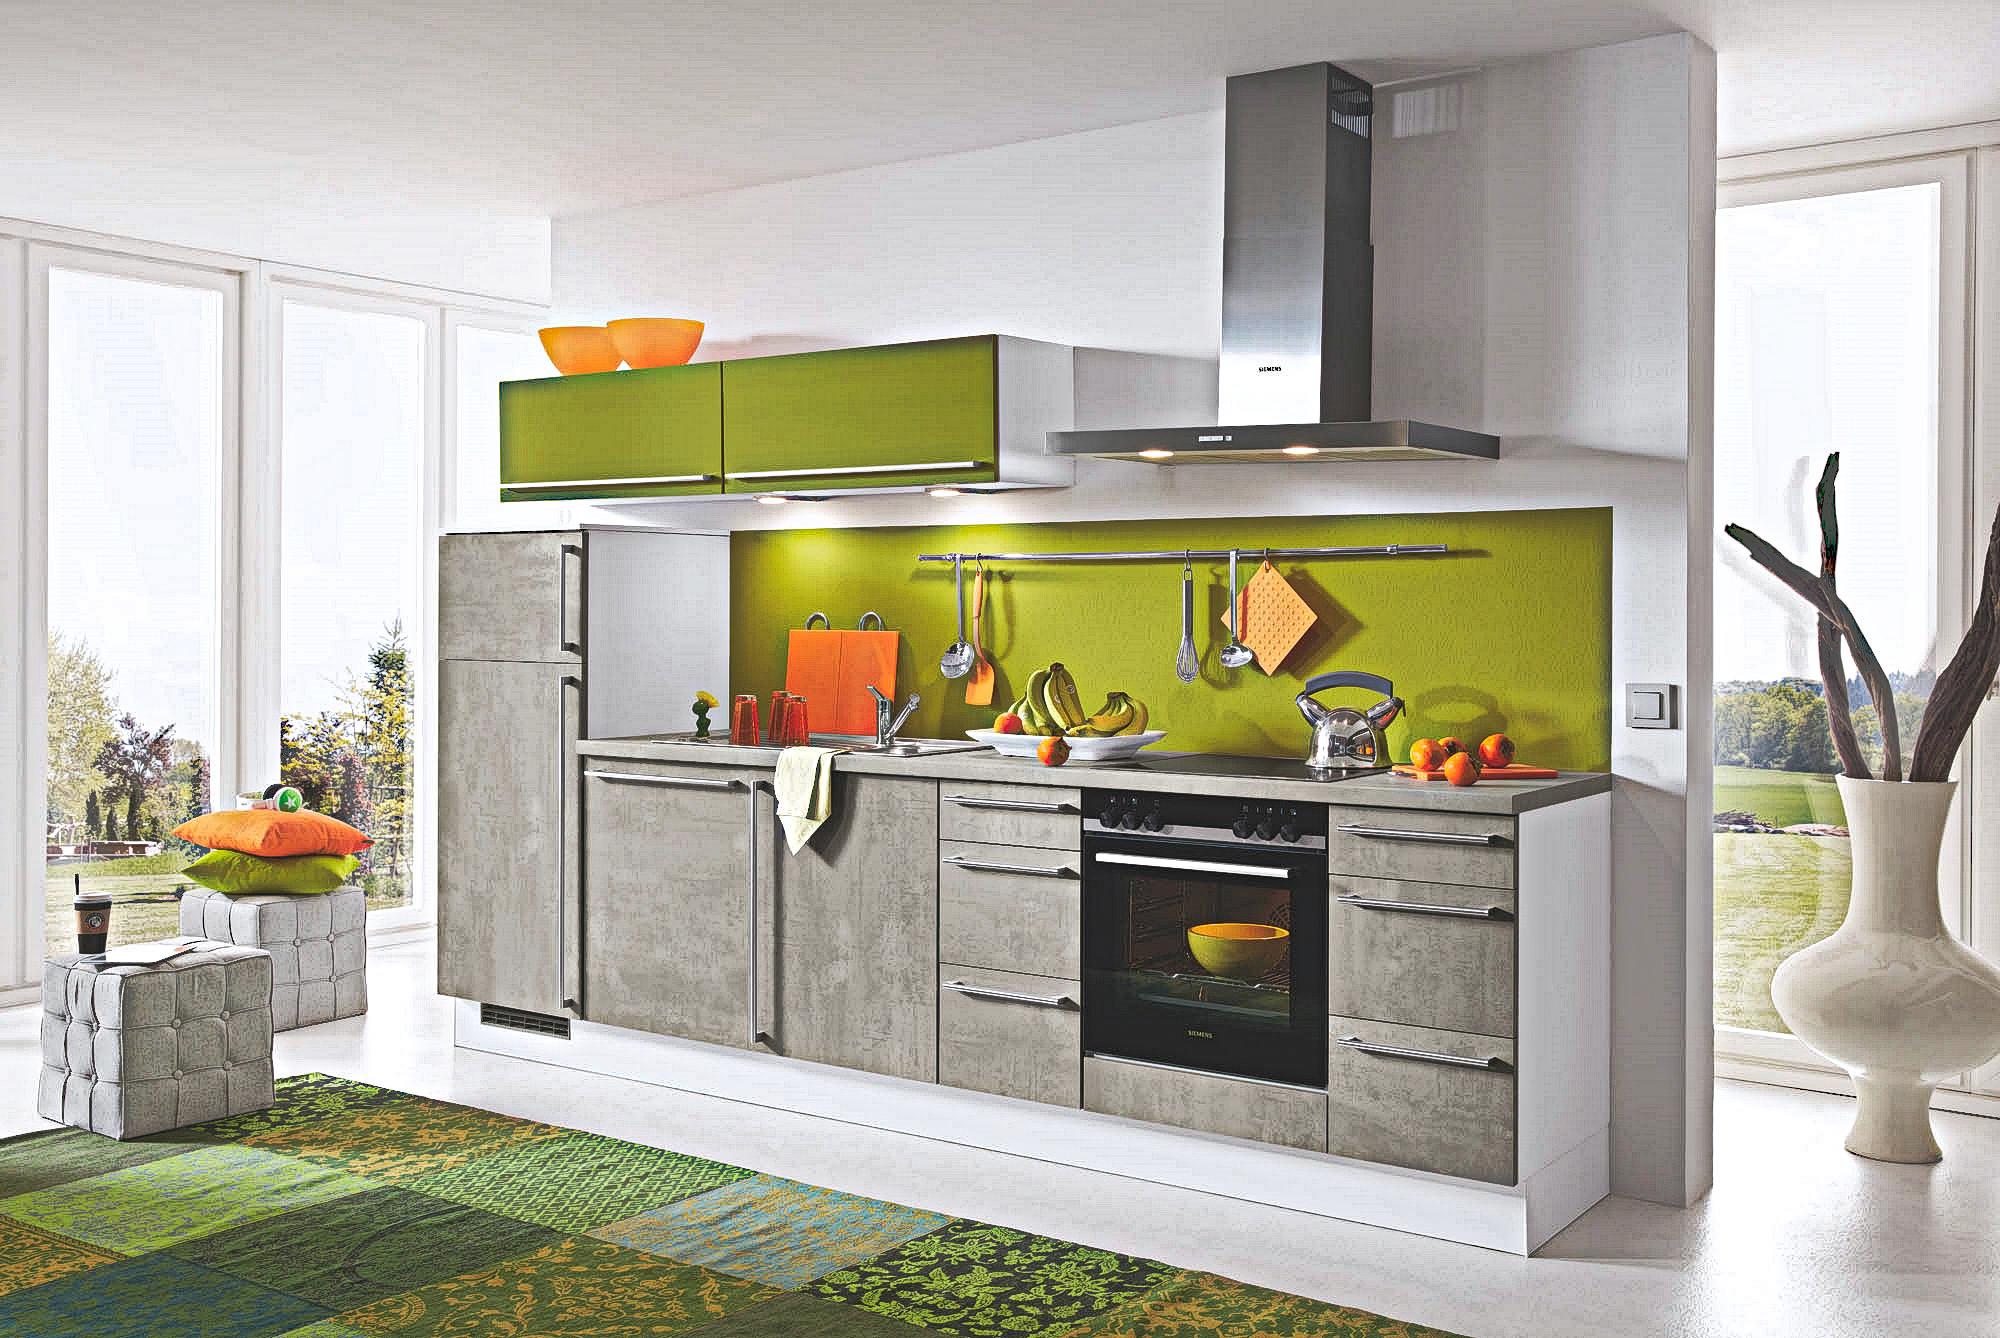 Full Size of Küche Ohne Elektrogeräte Günstig Kaufen Küche Ohne Elektrogeräte Gebraucht Küche Ohne Elektrogeräte Kaufen Sinnvoll Komplette Küche Ohne Elektrogeräte Küche Küche Ohne Elektrogeräte